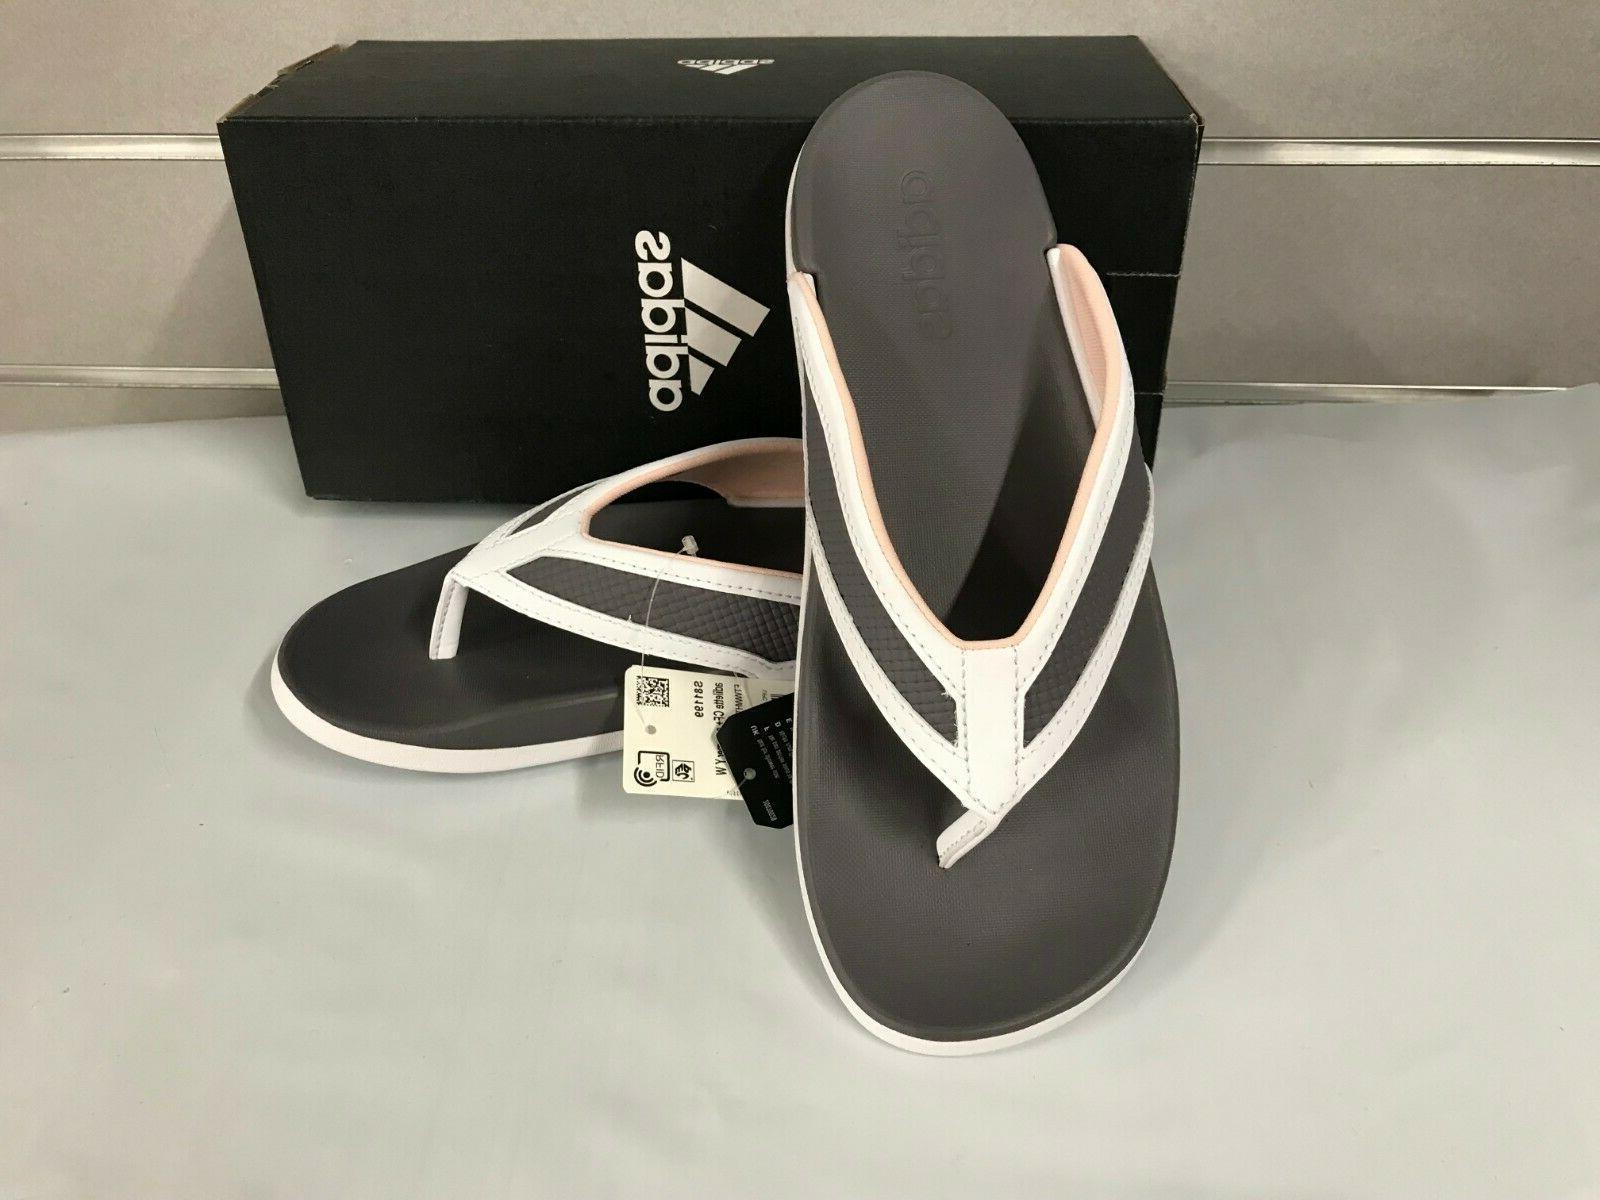 Adidas Womens Flip S81199 GREY/PINK NEW